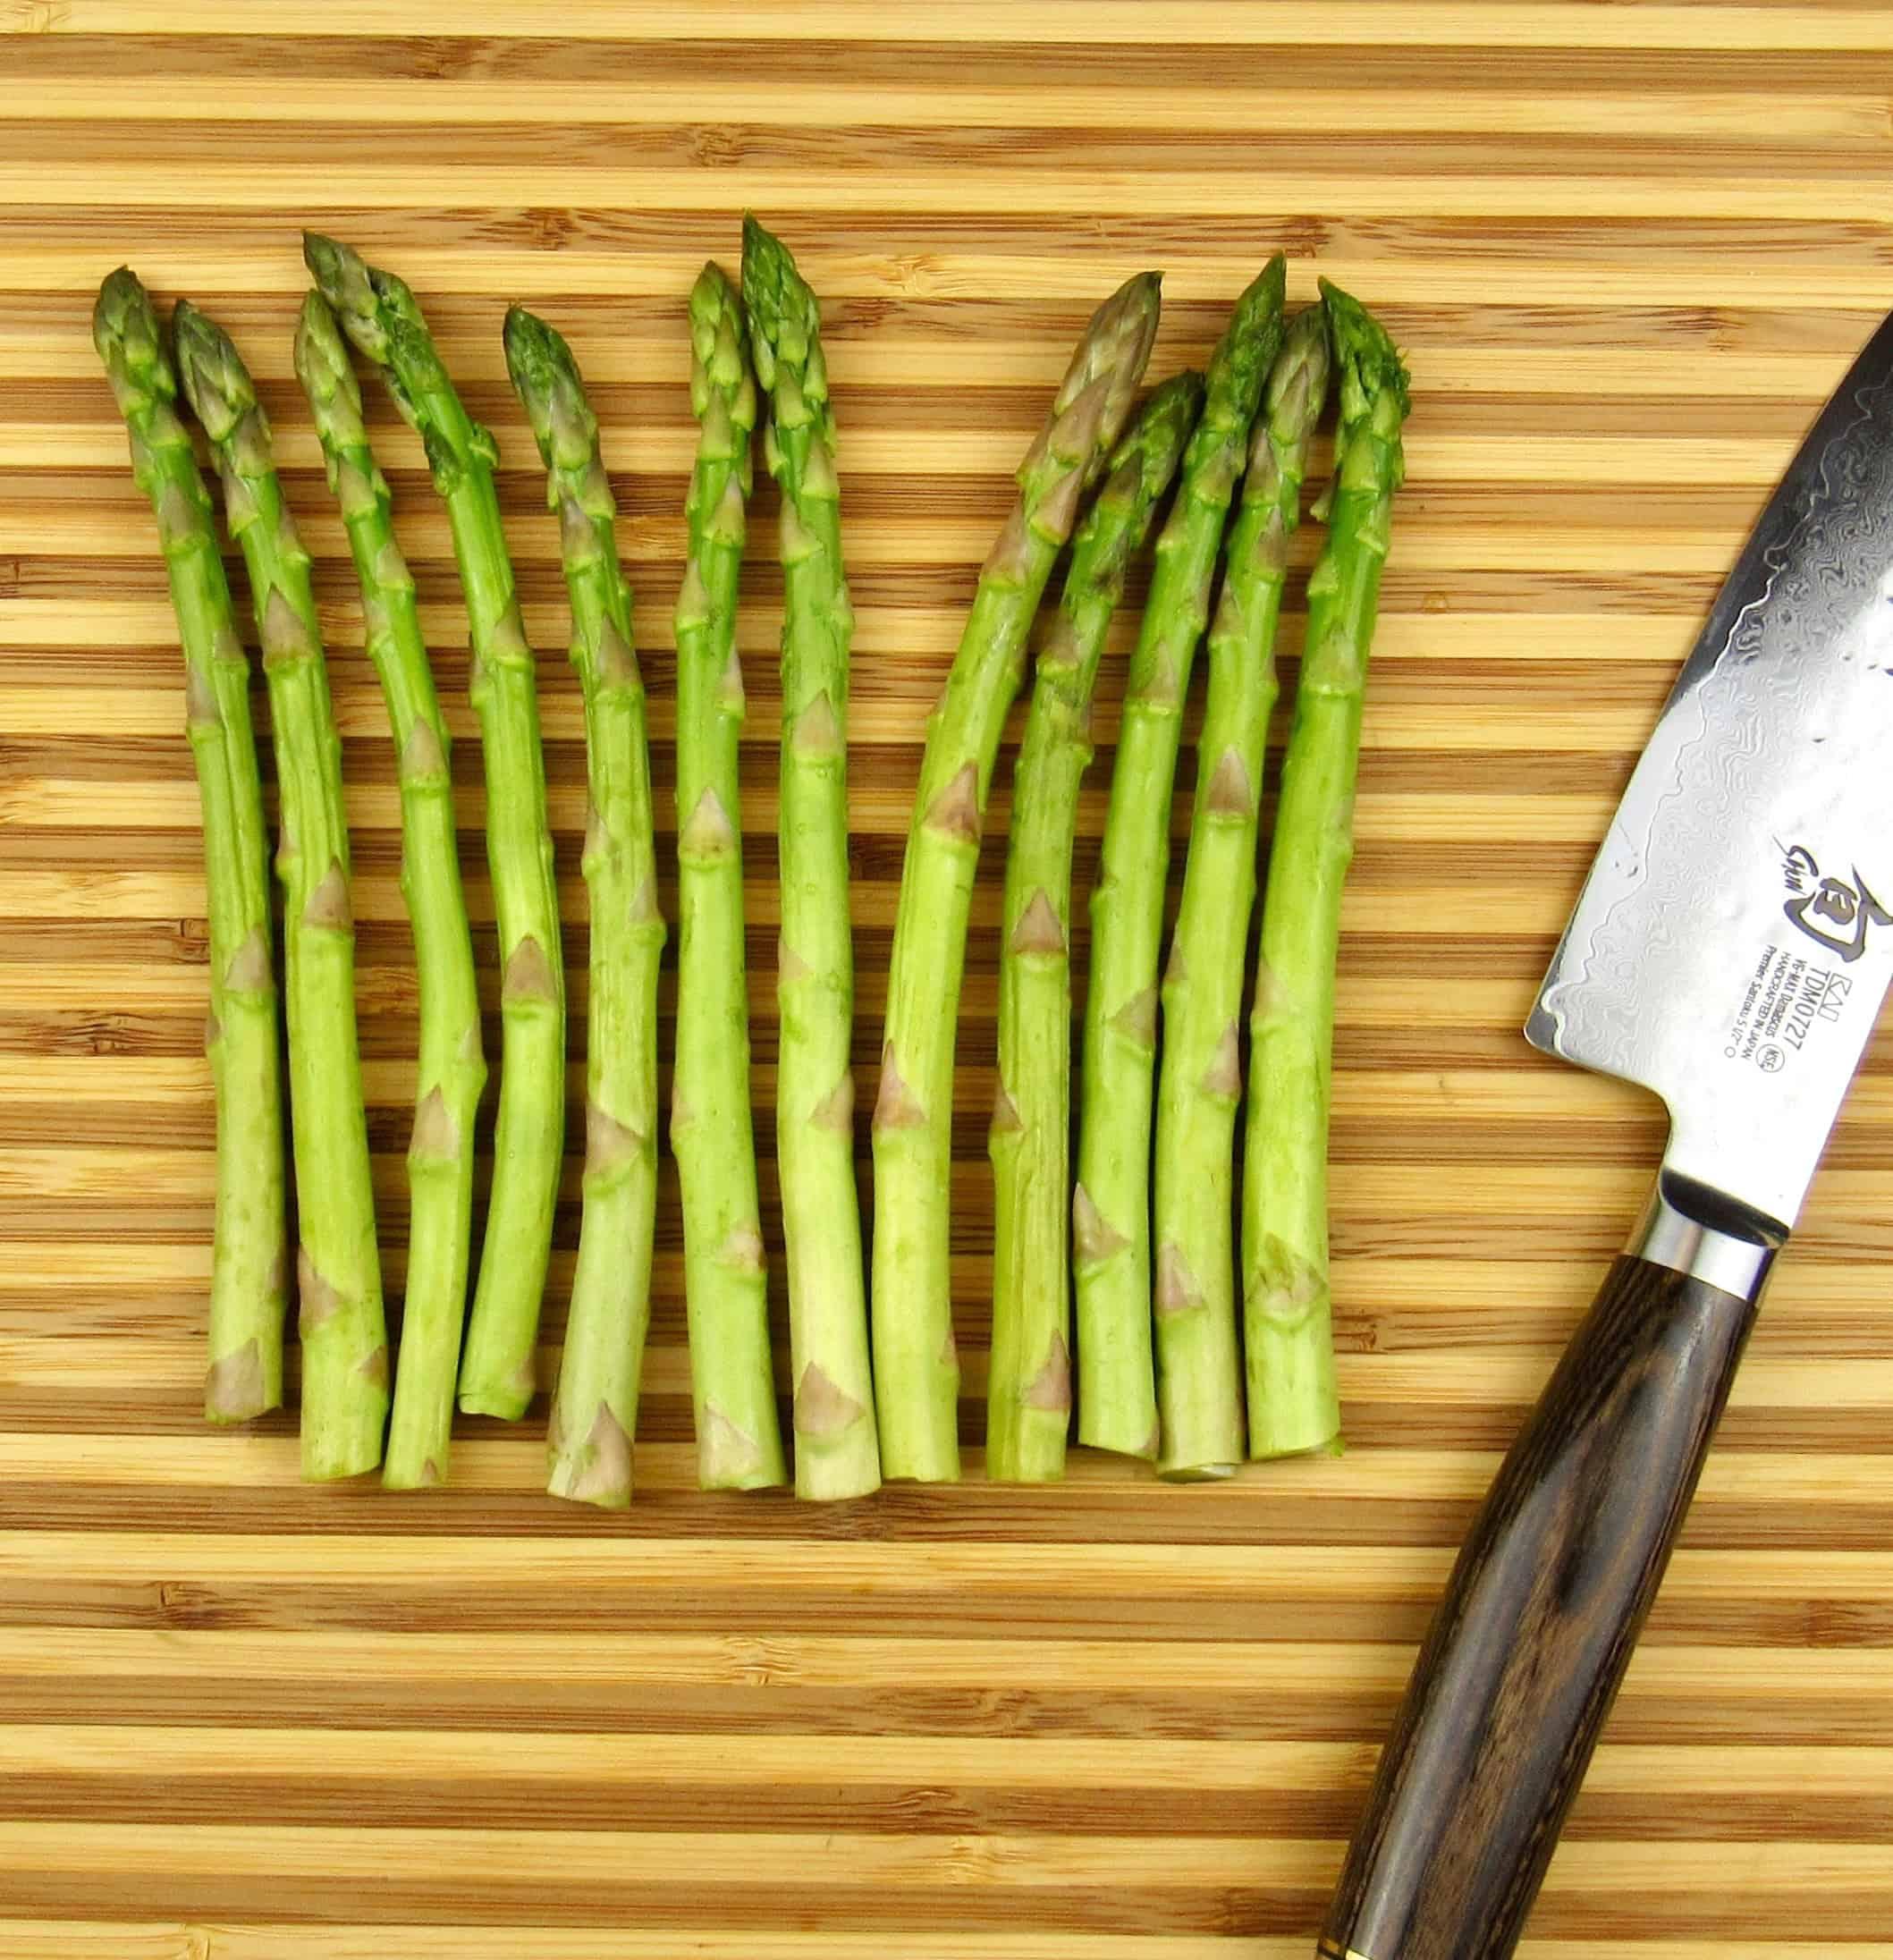 cut asparagus on cutting board with knife